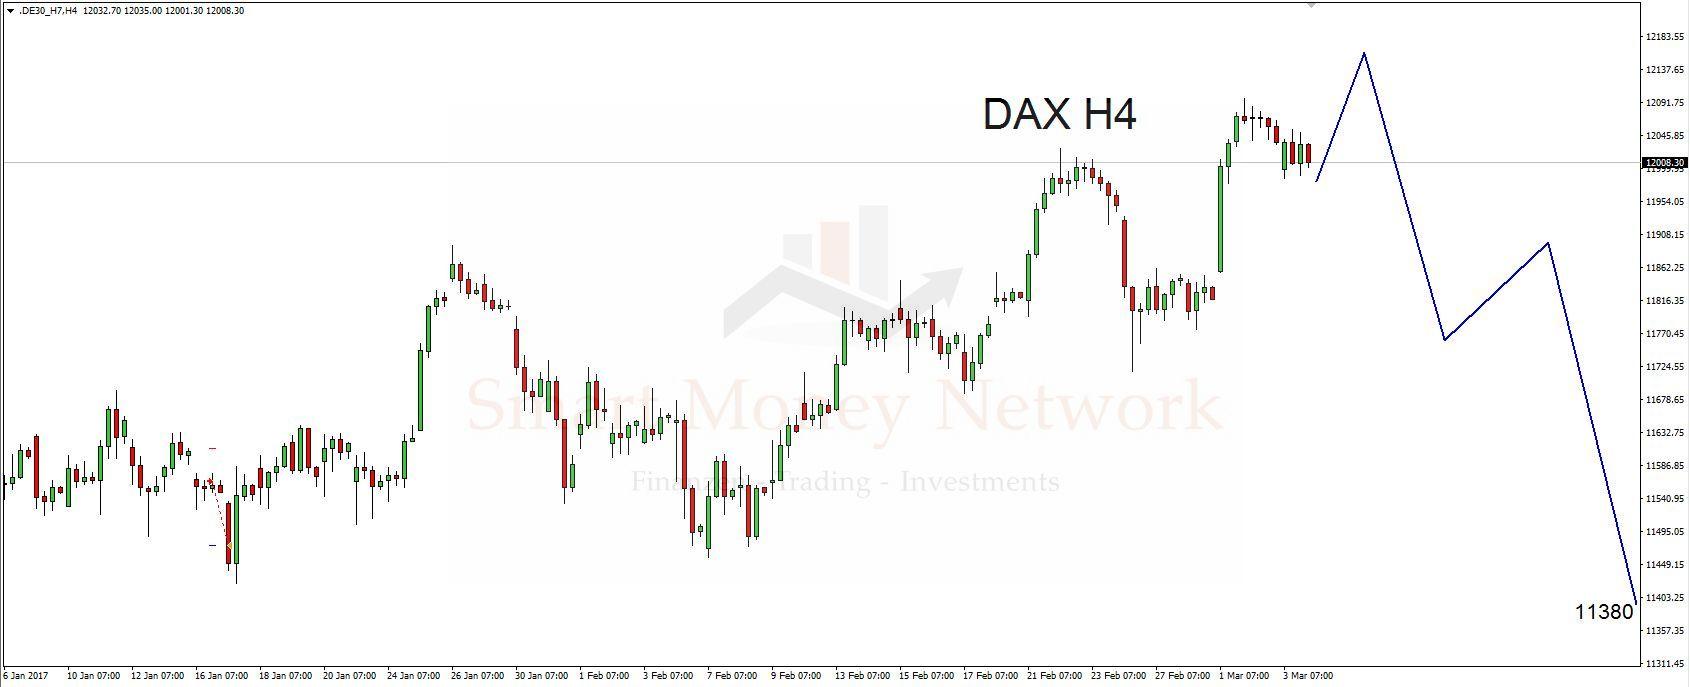 dax04.03.17